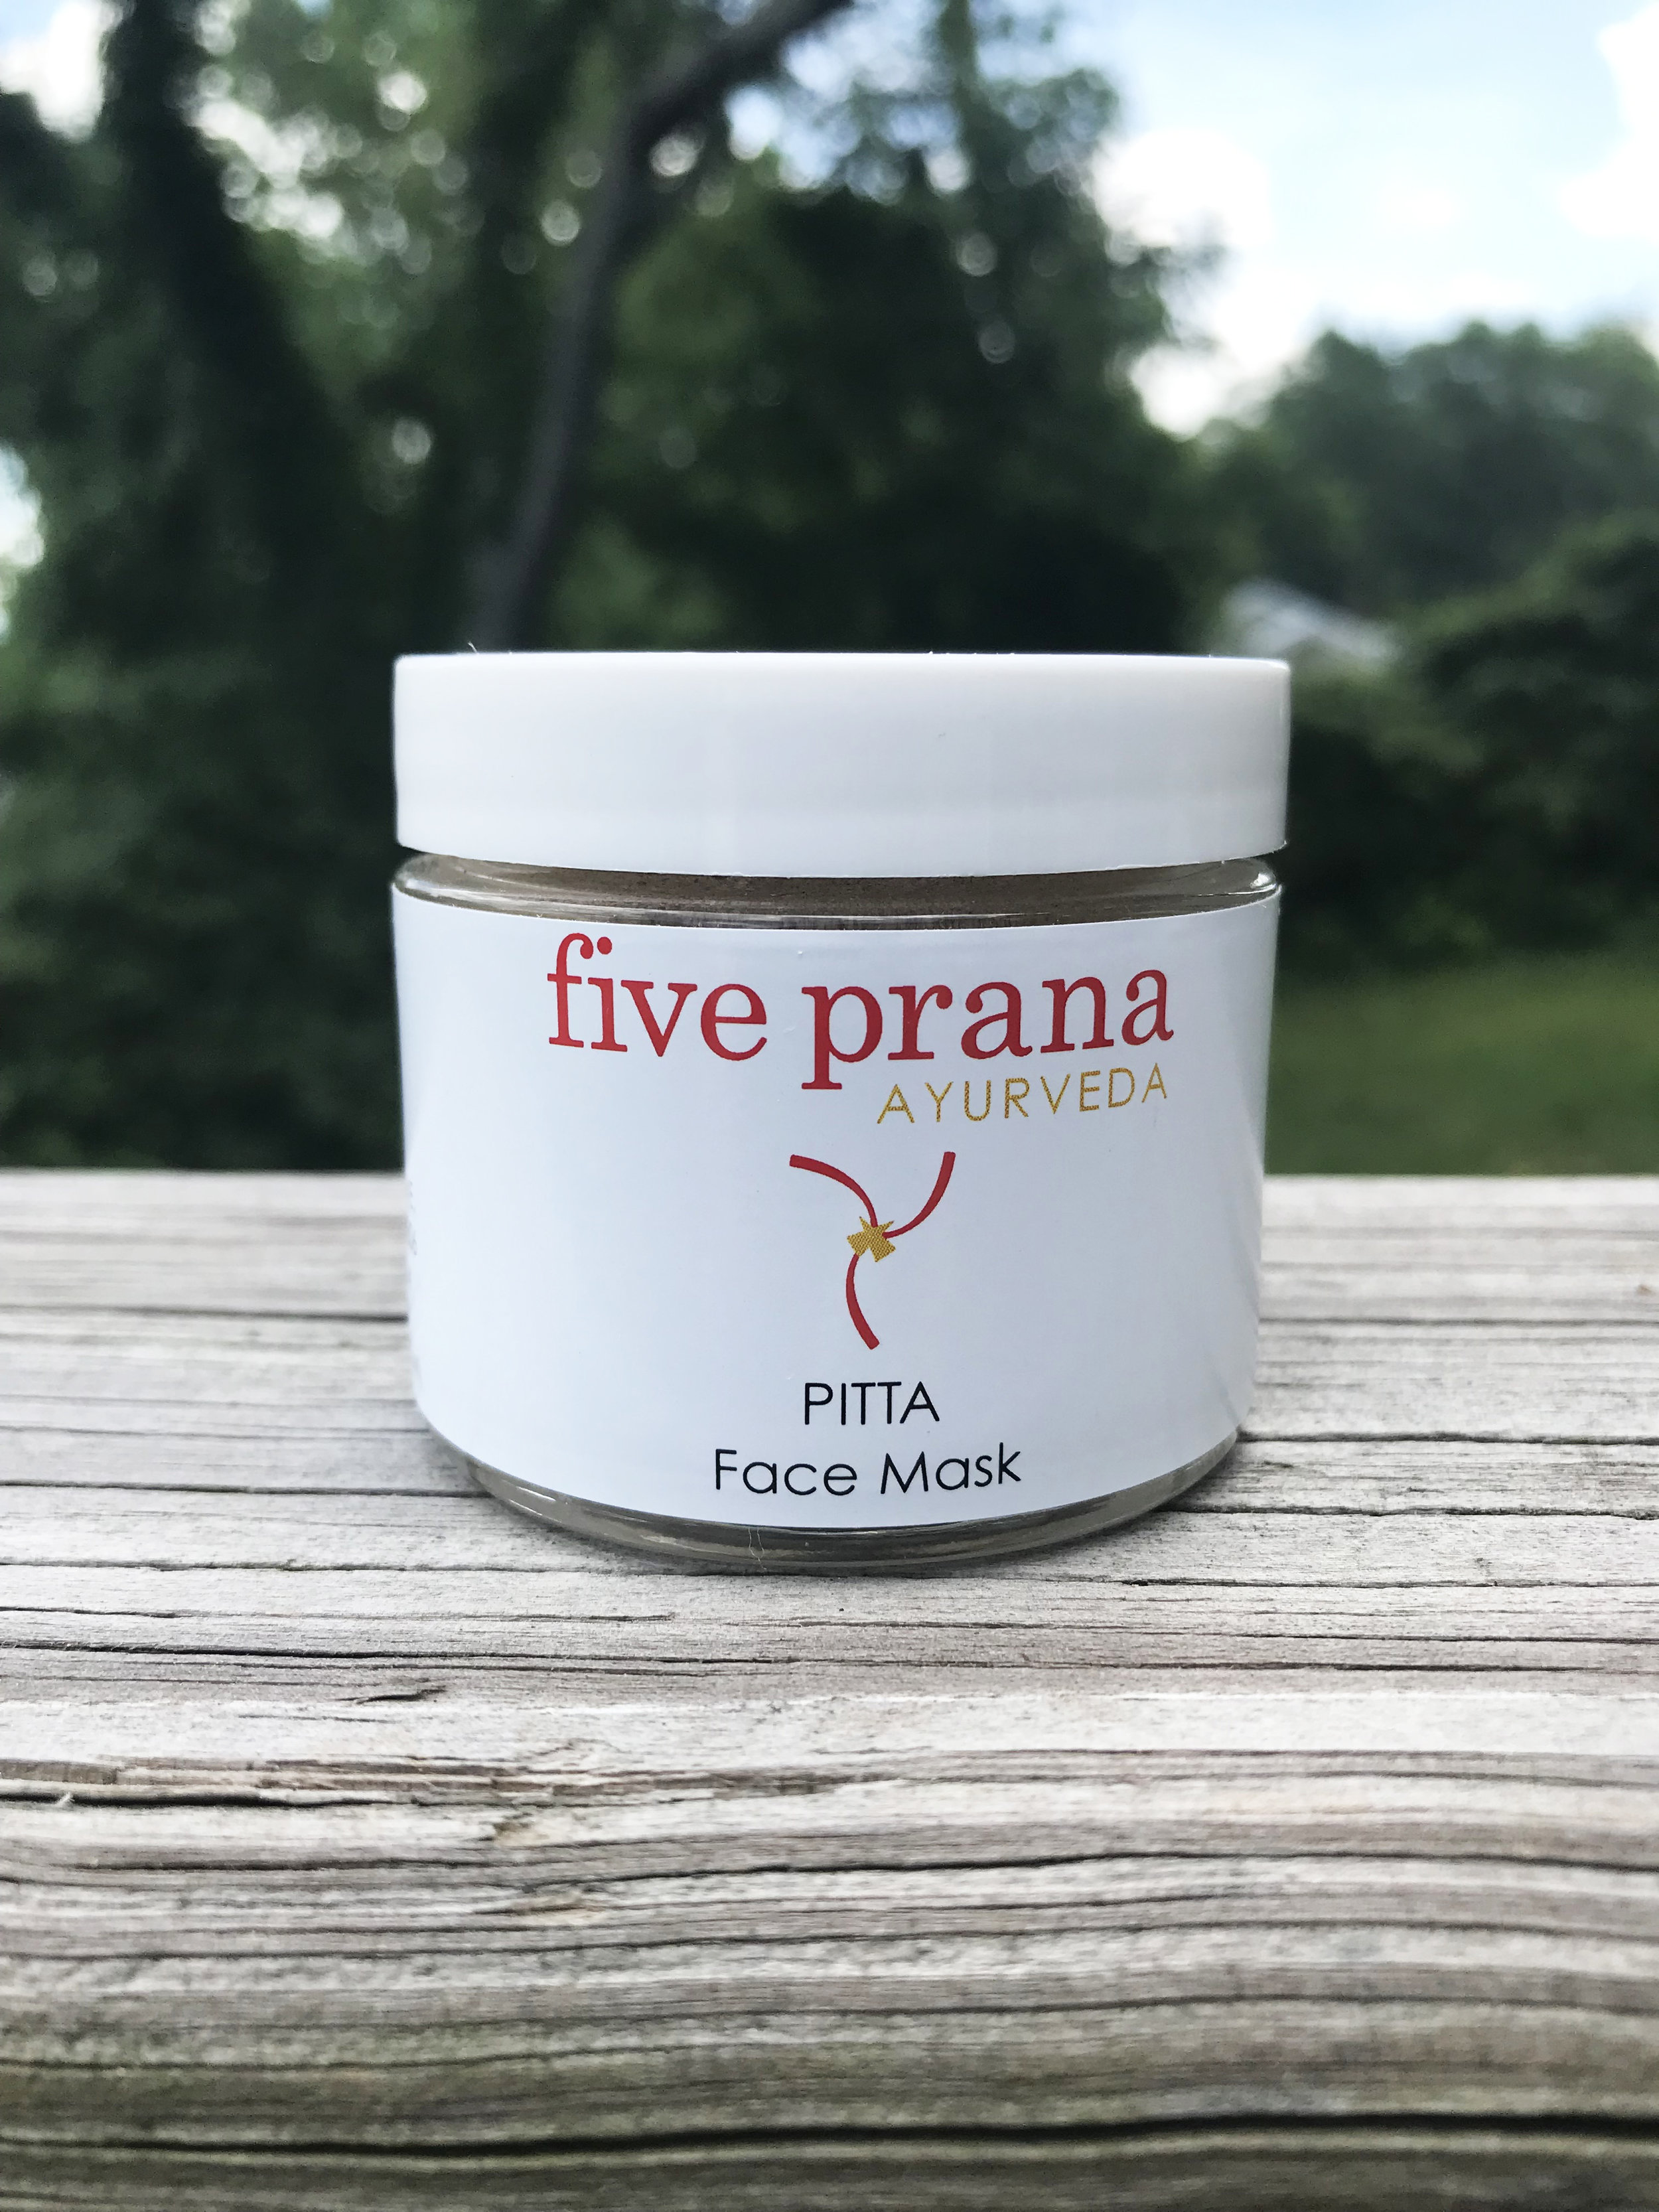 Five Prana Ayurveda Pitta Face Mask